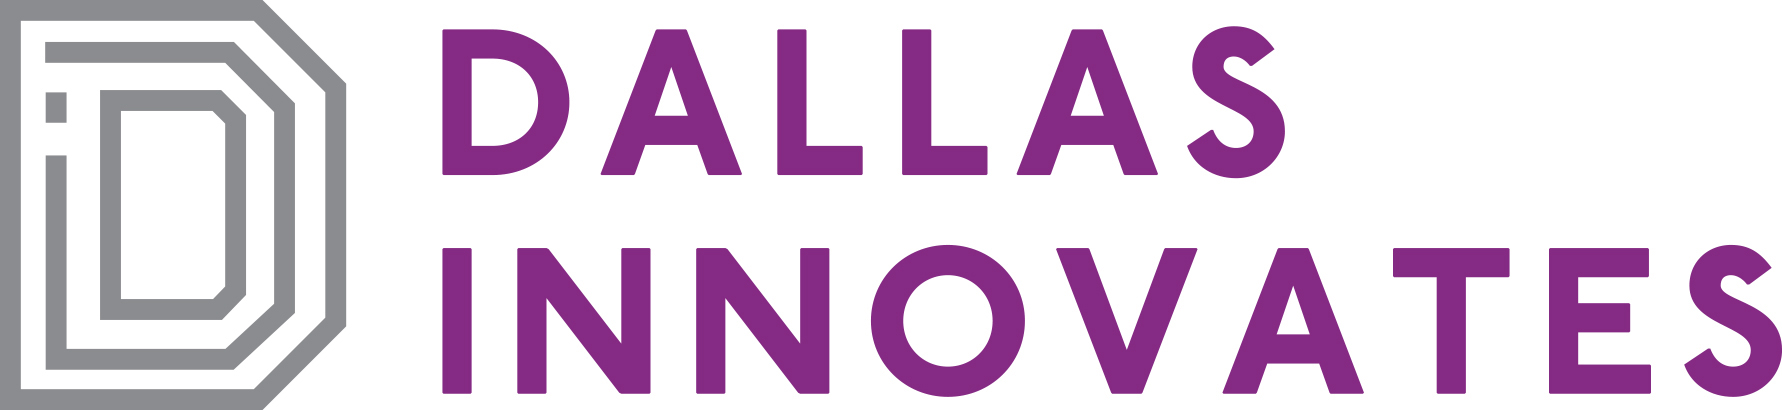 Dallas Innovates logo purple copy